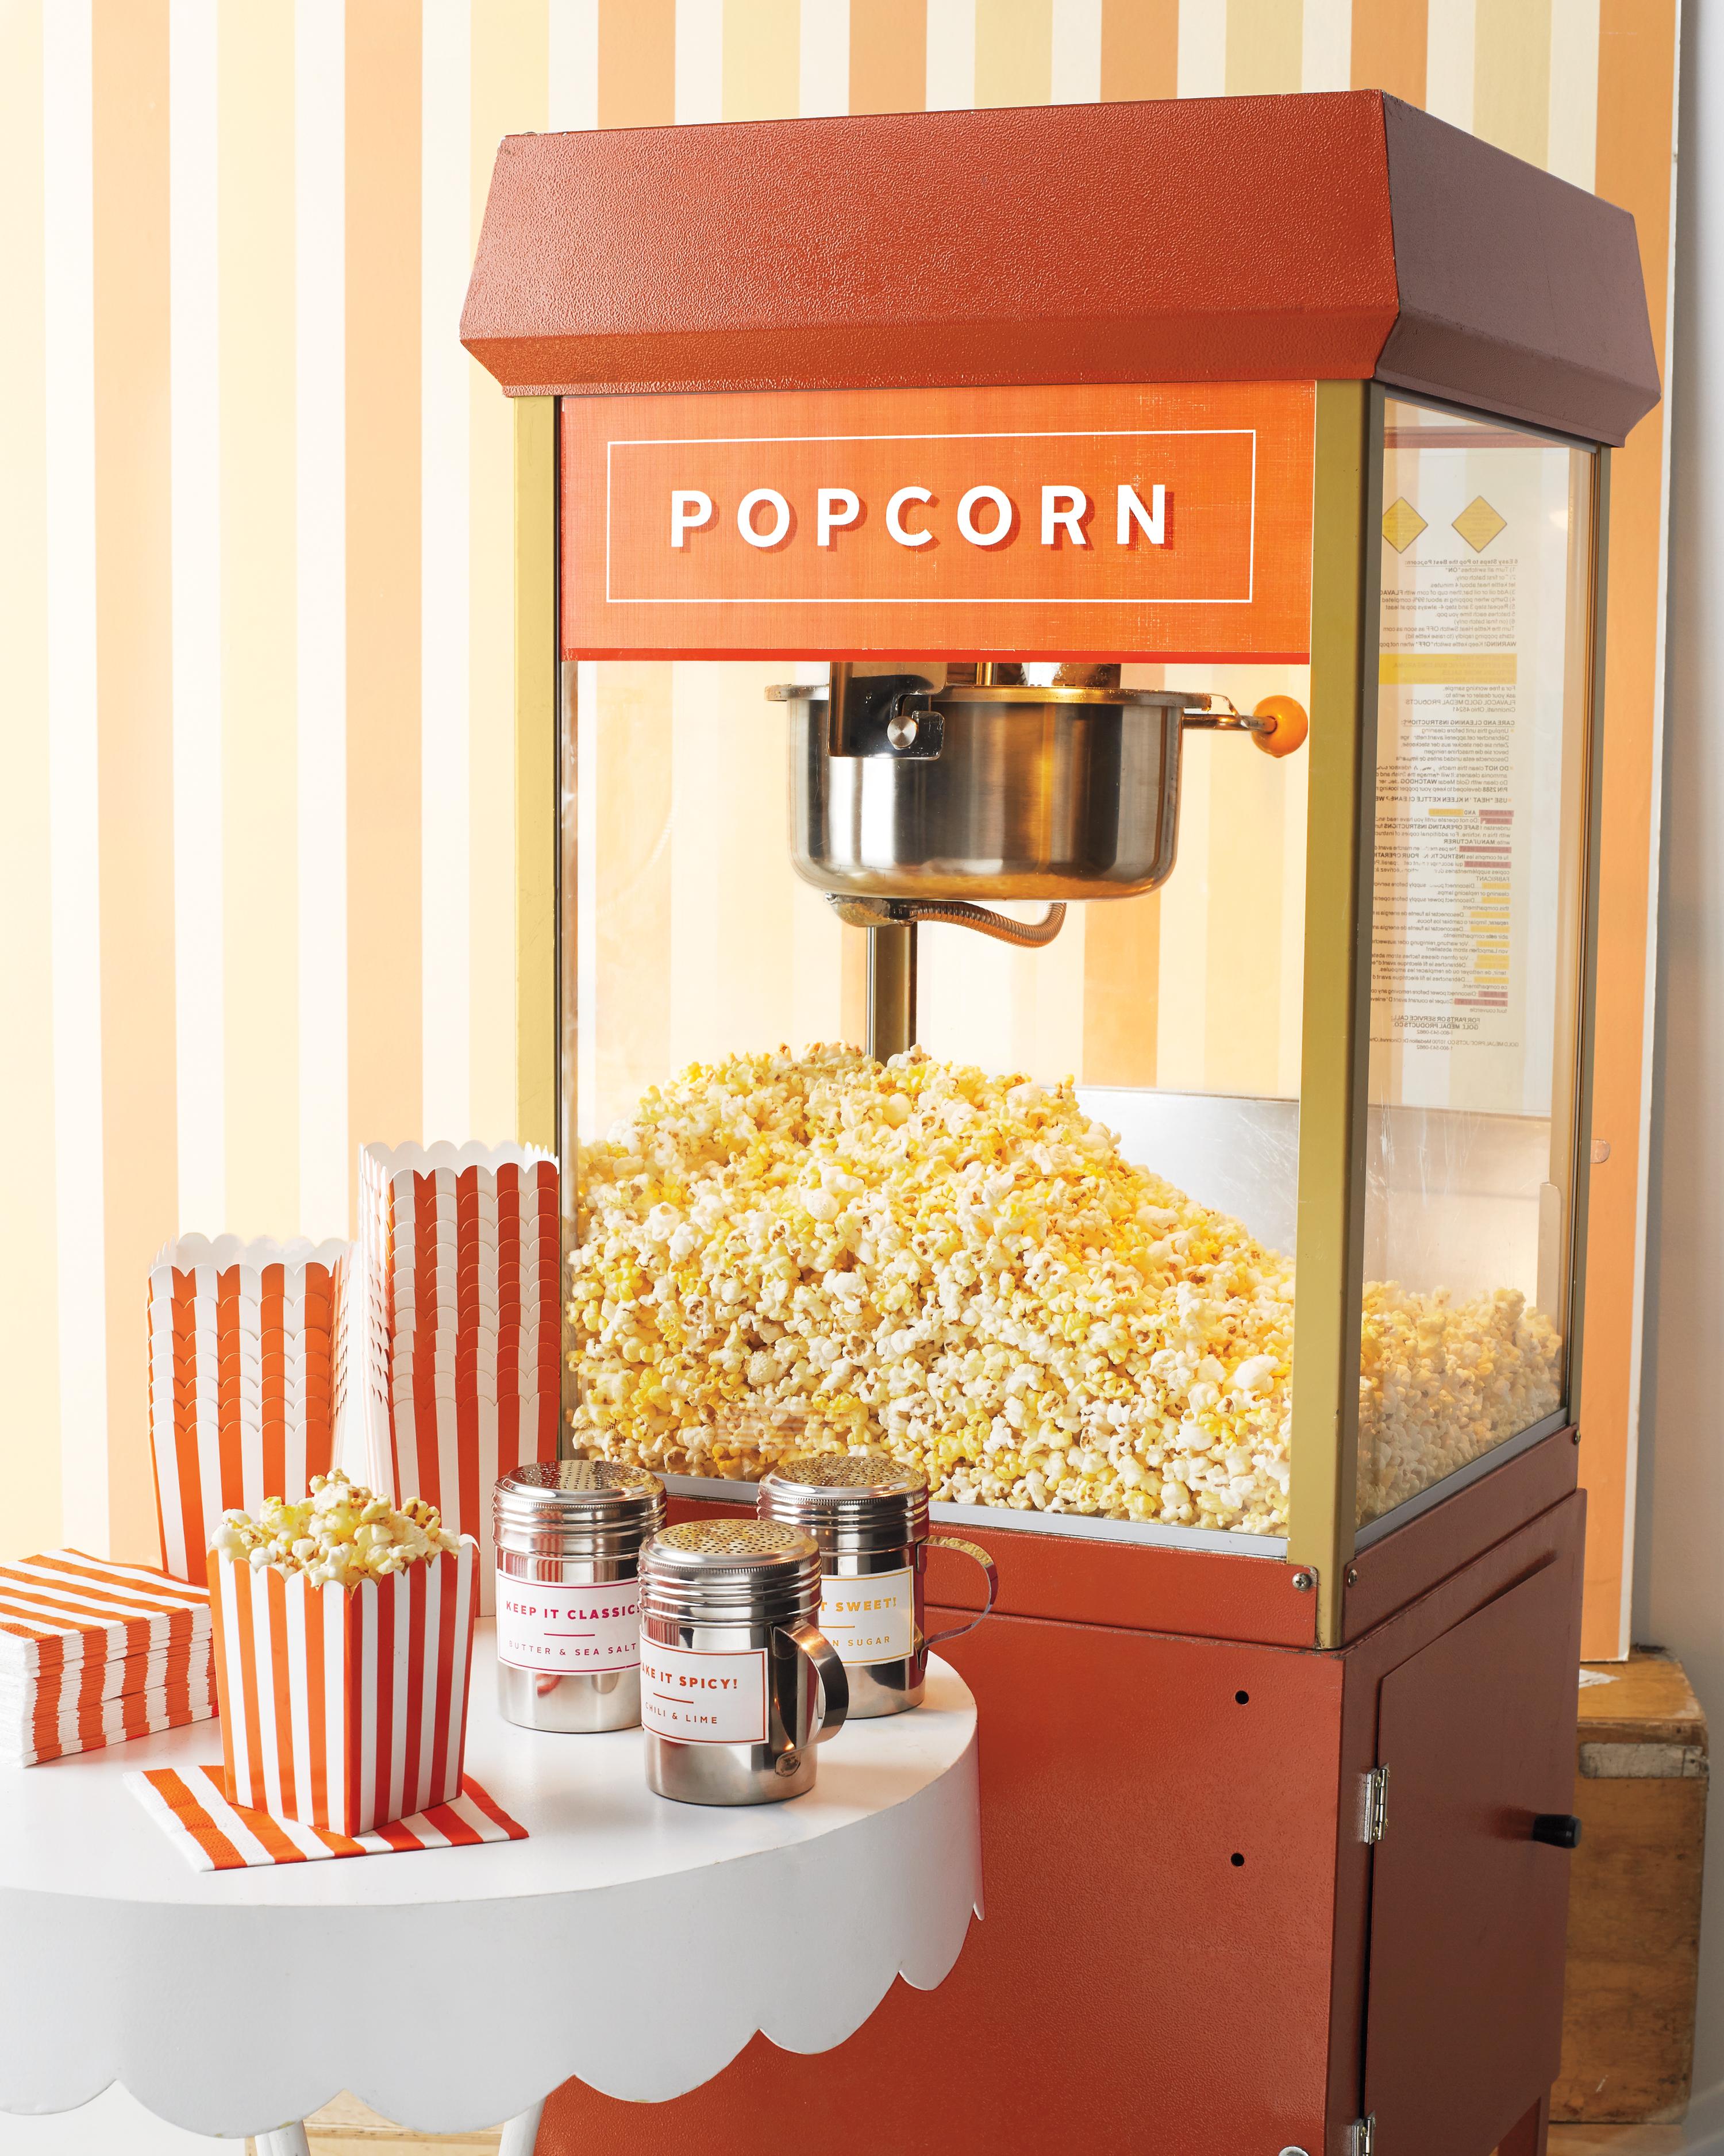 popcorn-046-d111205-comp.jpg